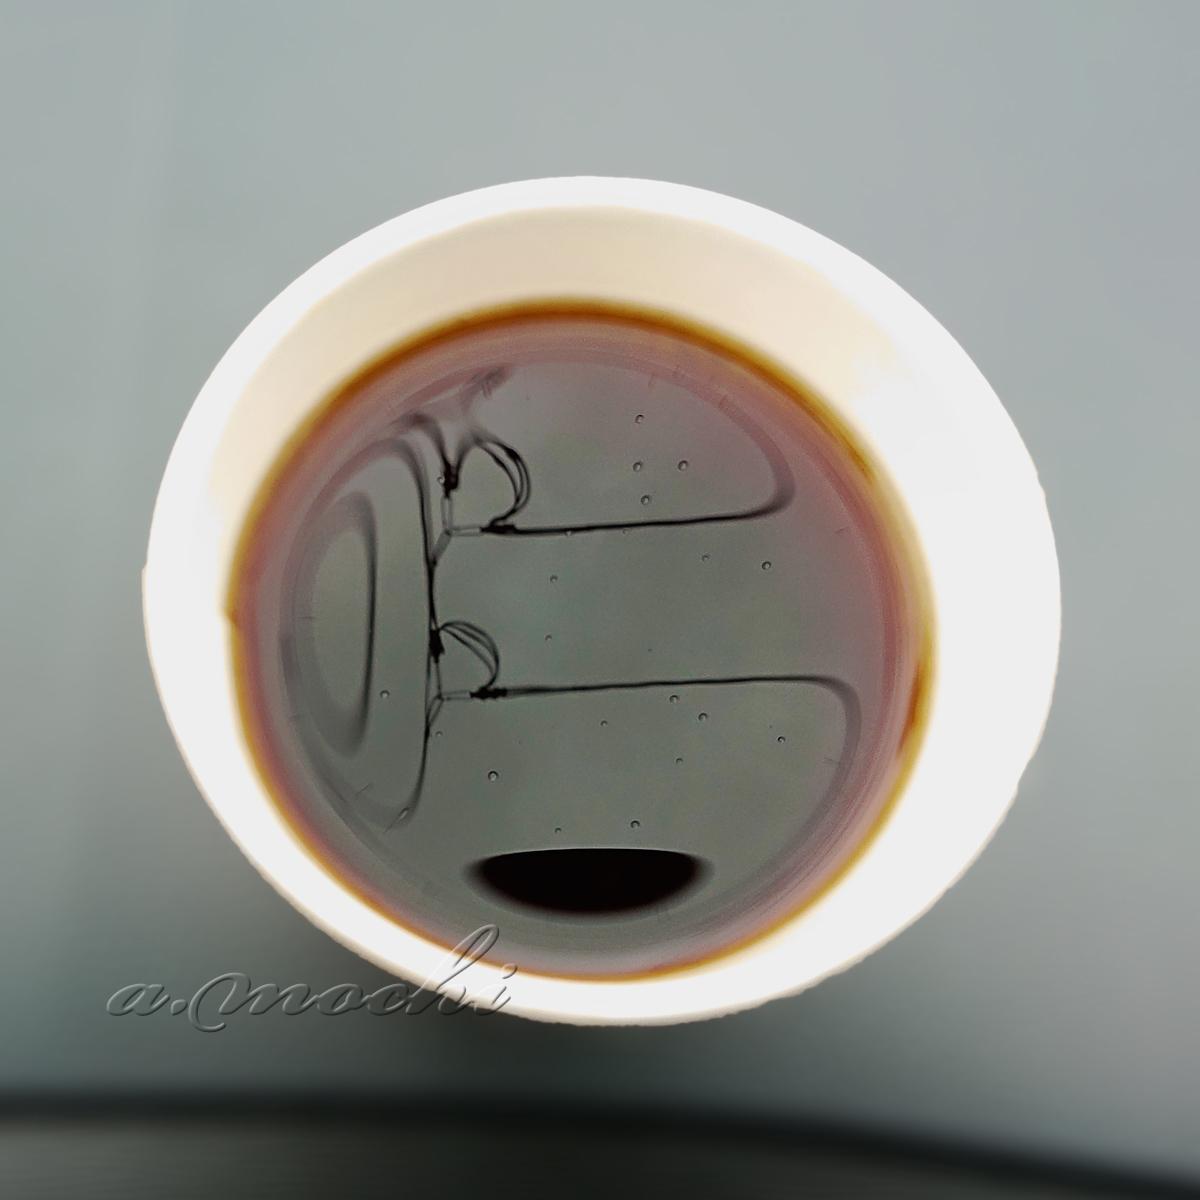 anpasand_coffee.jpg